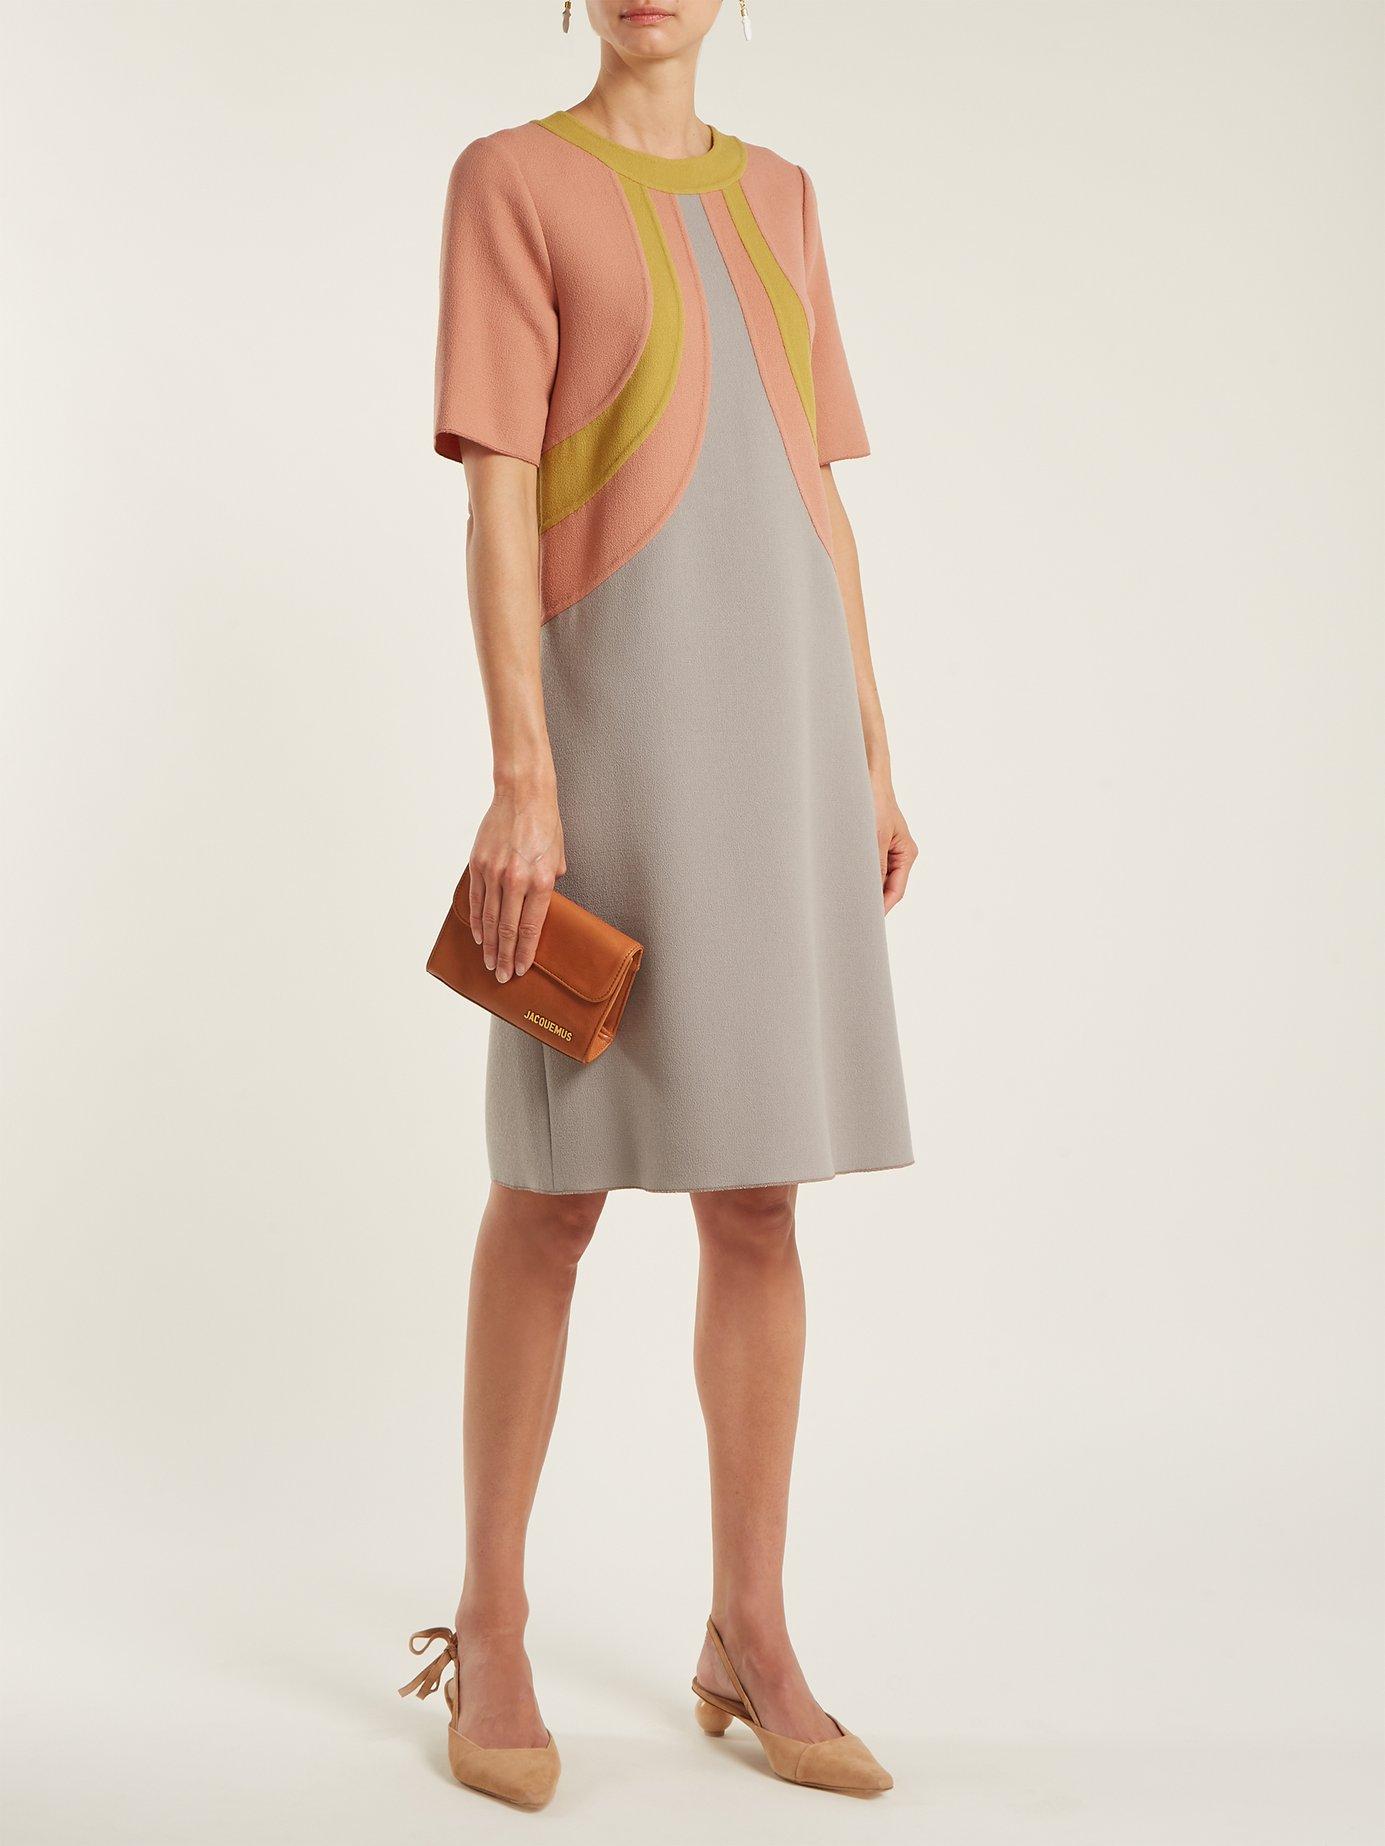 Colour-block wool dress by Bottega Veneta